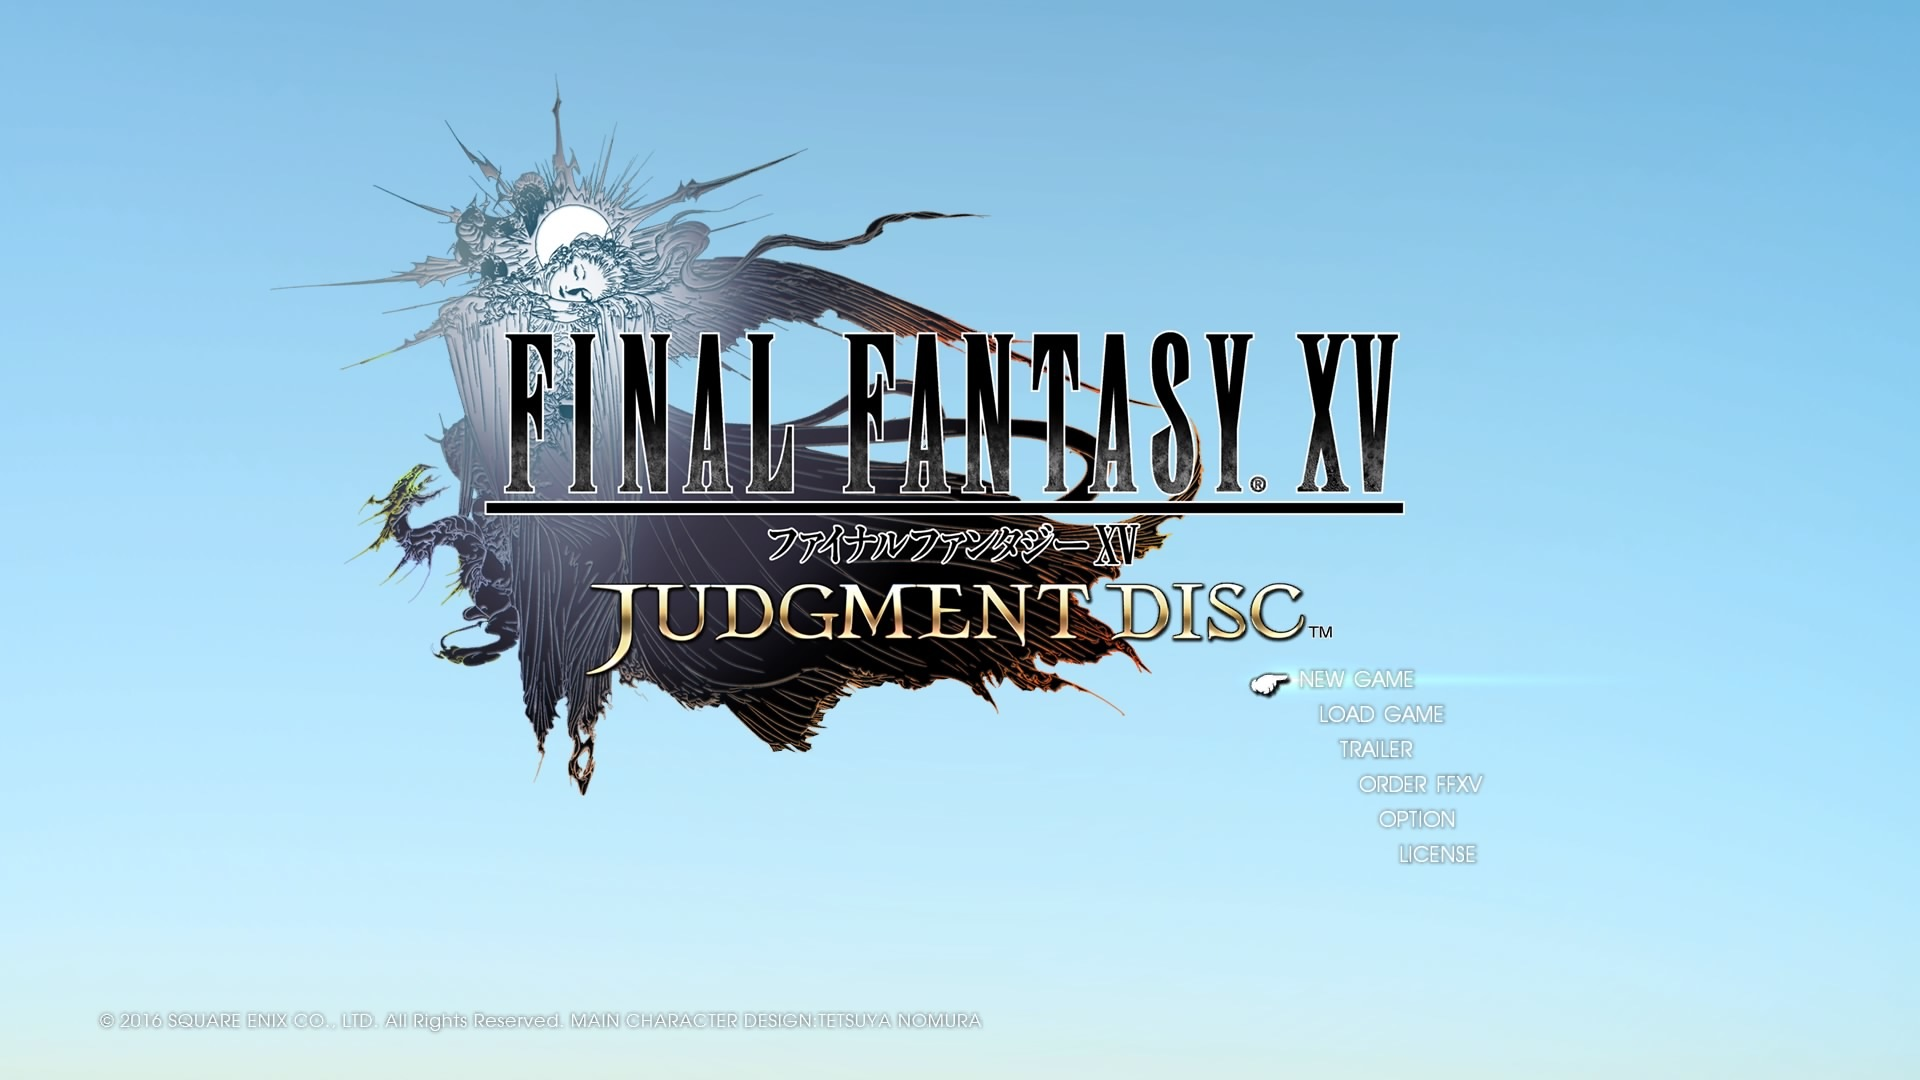 FINAL FANTASY XV JUDGMENT DISC_20161111233429